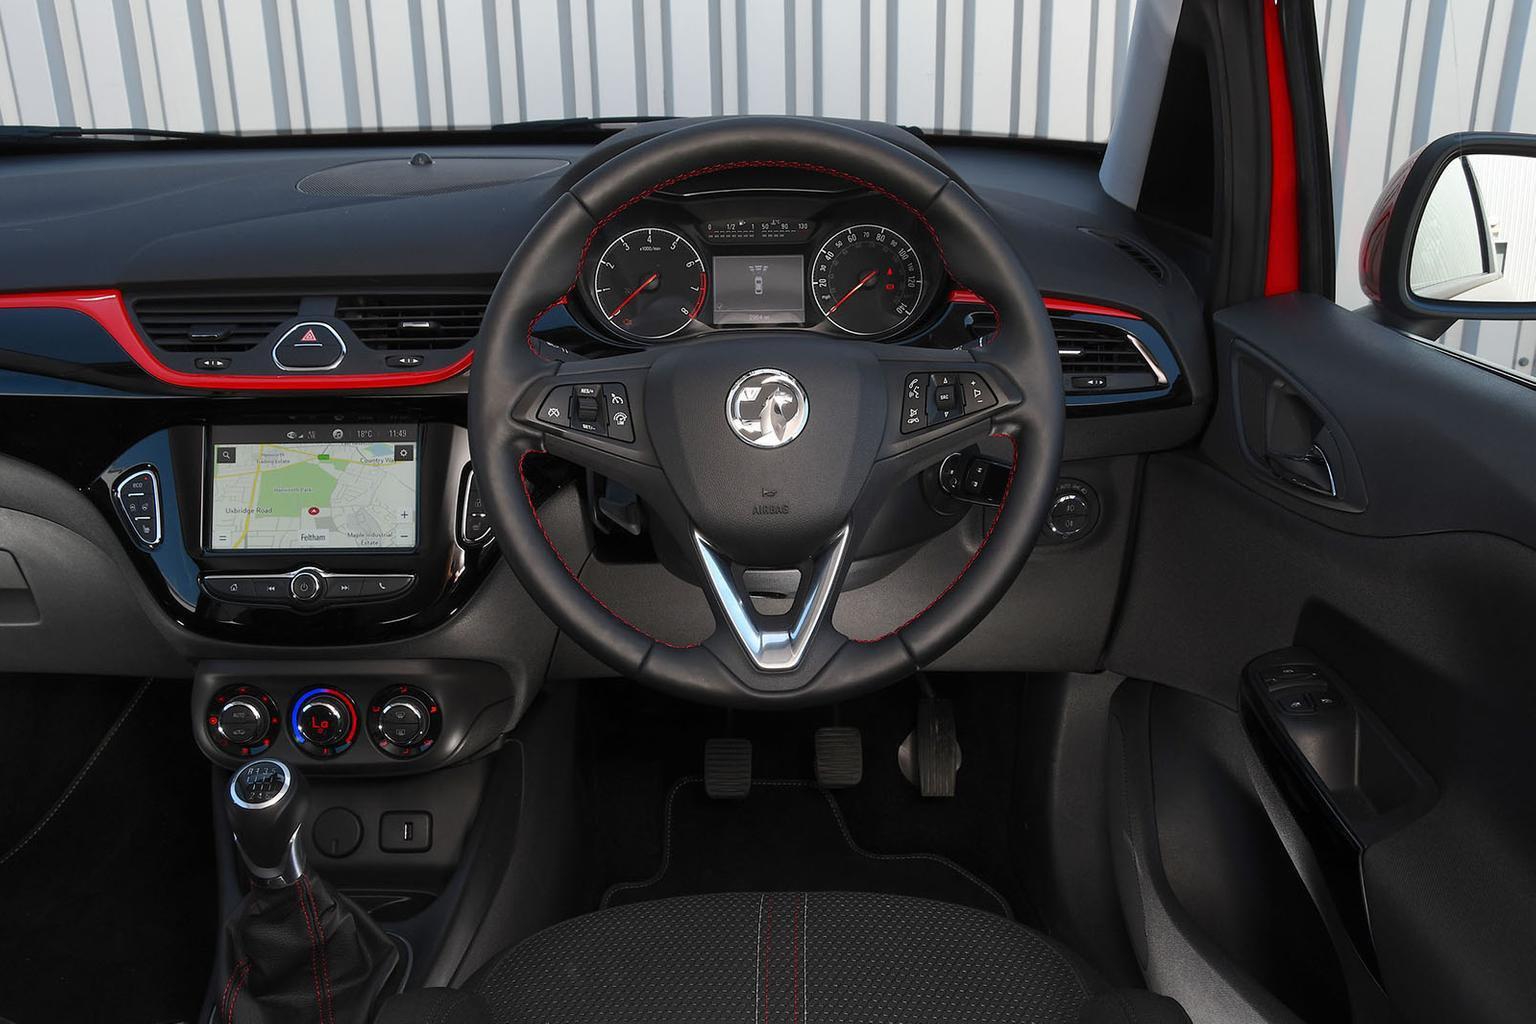 Vauxhall Corsa 1.4 75 Energy 3dr - interior